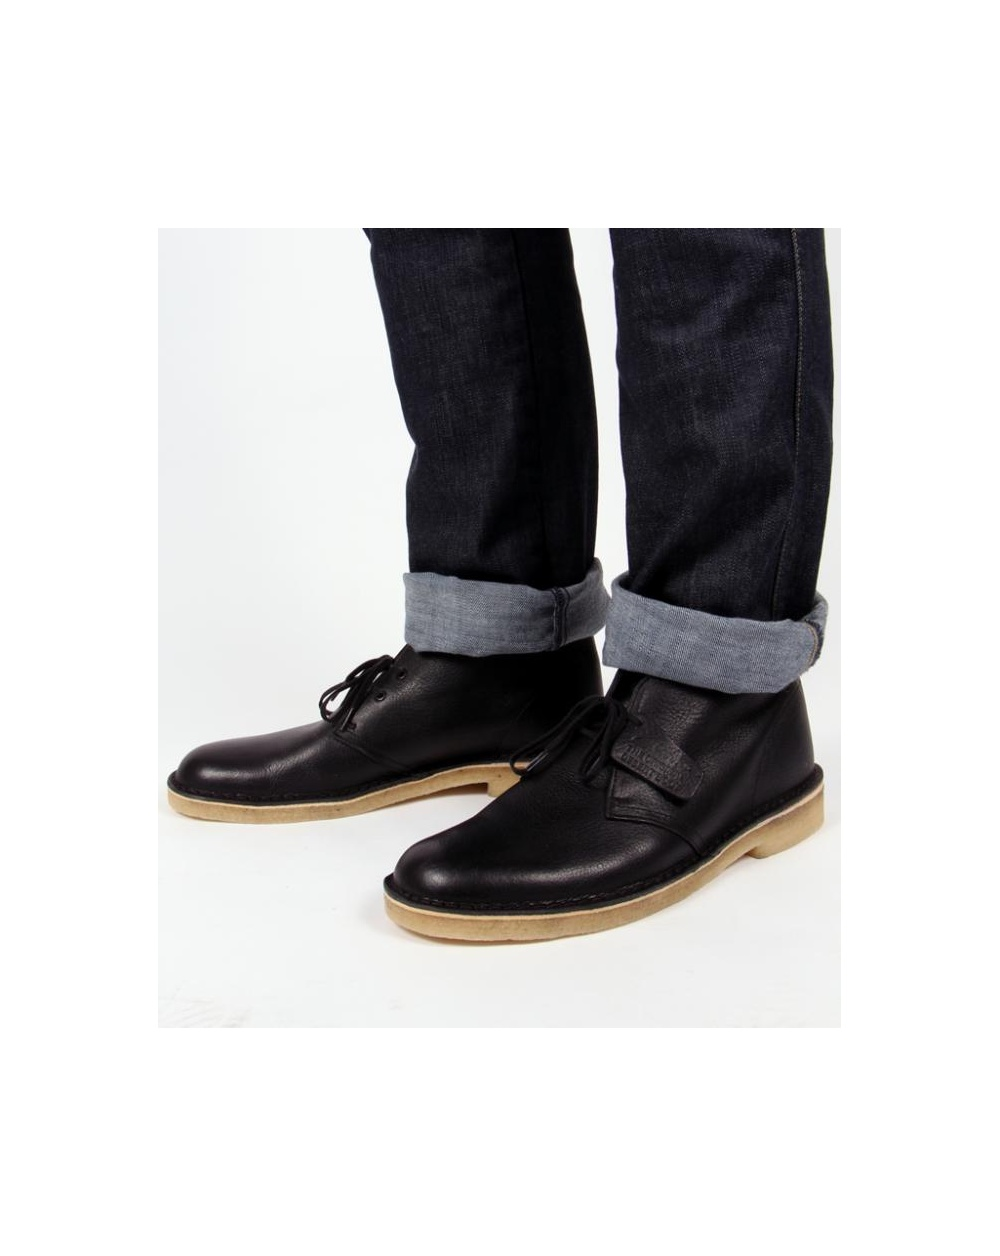 2dce0ee19aaaf Clarks Originals Desert Boot In Leather Black Leather - clarks ...